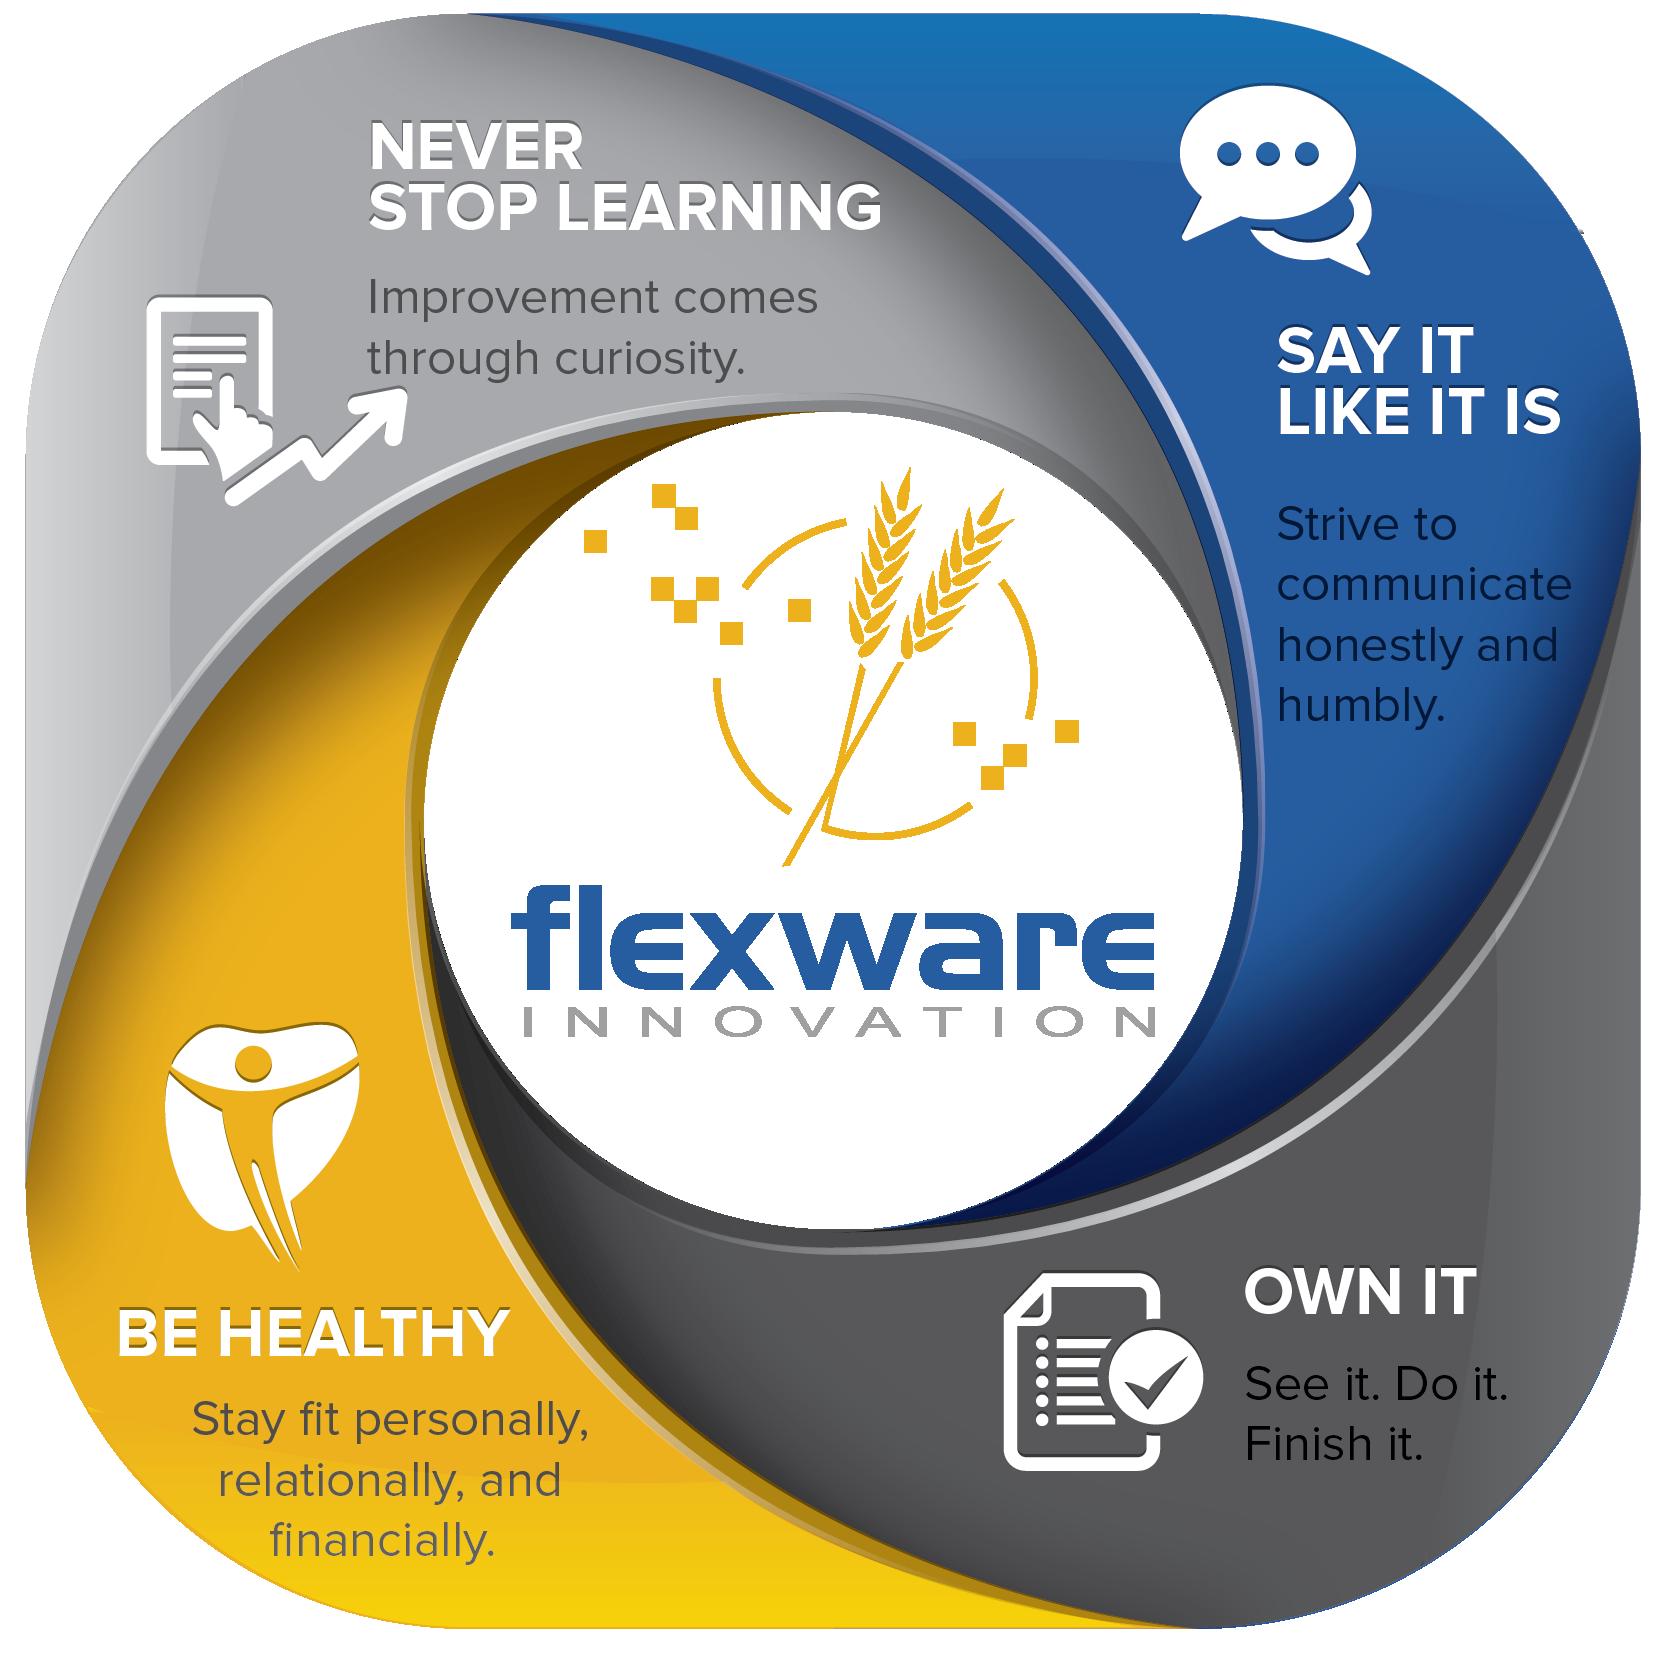 Flexware-Values-2014-TransparentBackground